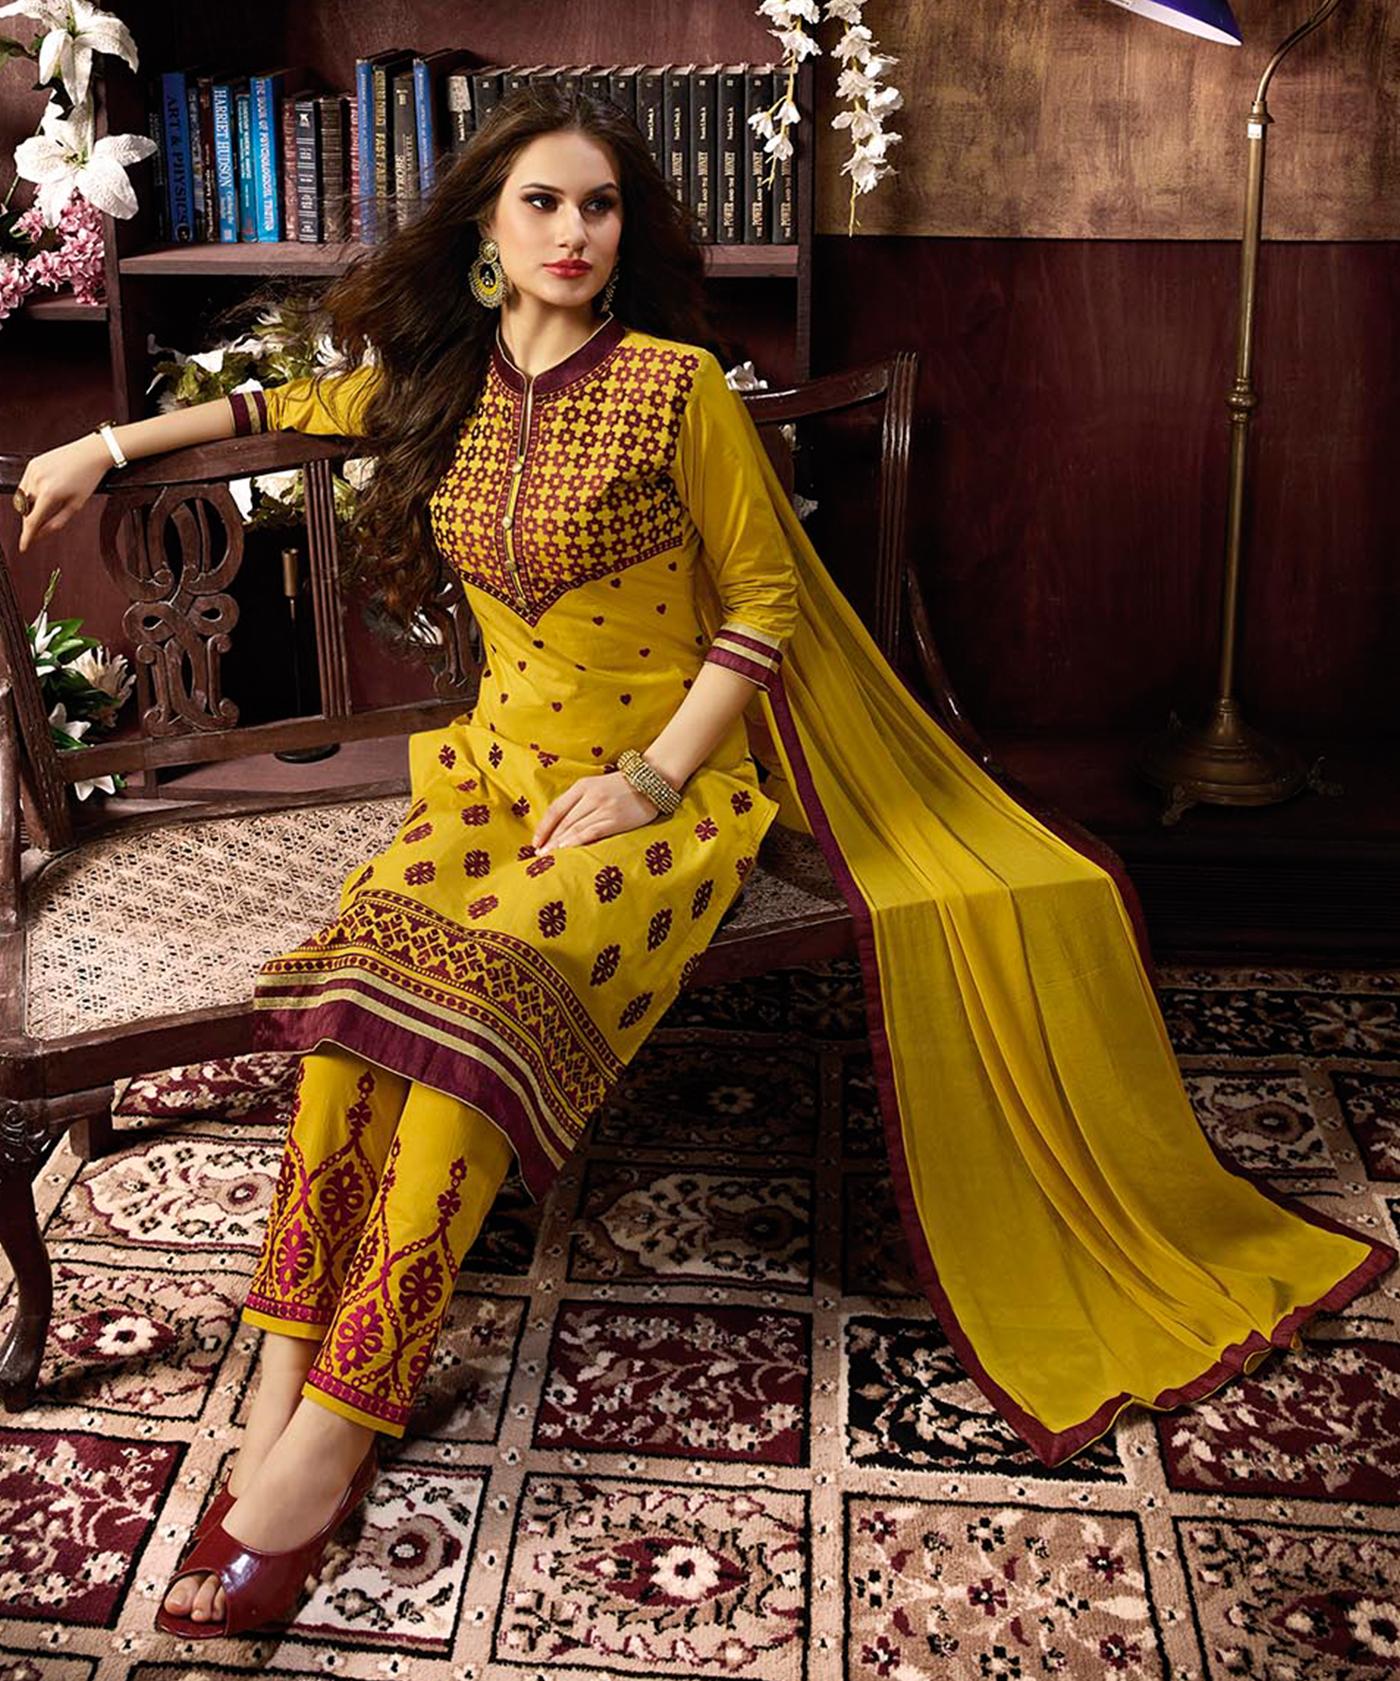 c5be243f22d Haldi Yellow Cotton Straight Semi Stitched Salwar Kameez - Online Shopping  India ...